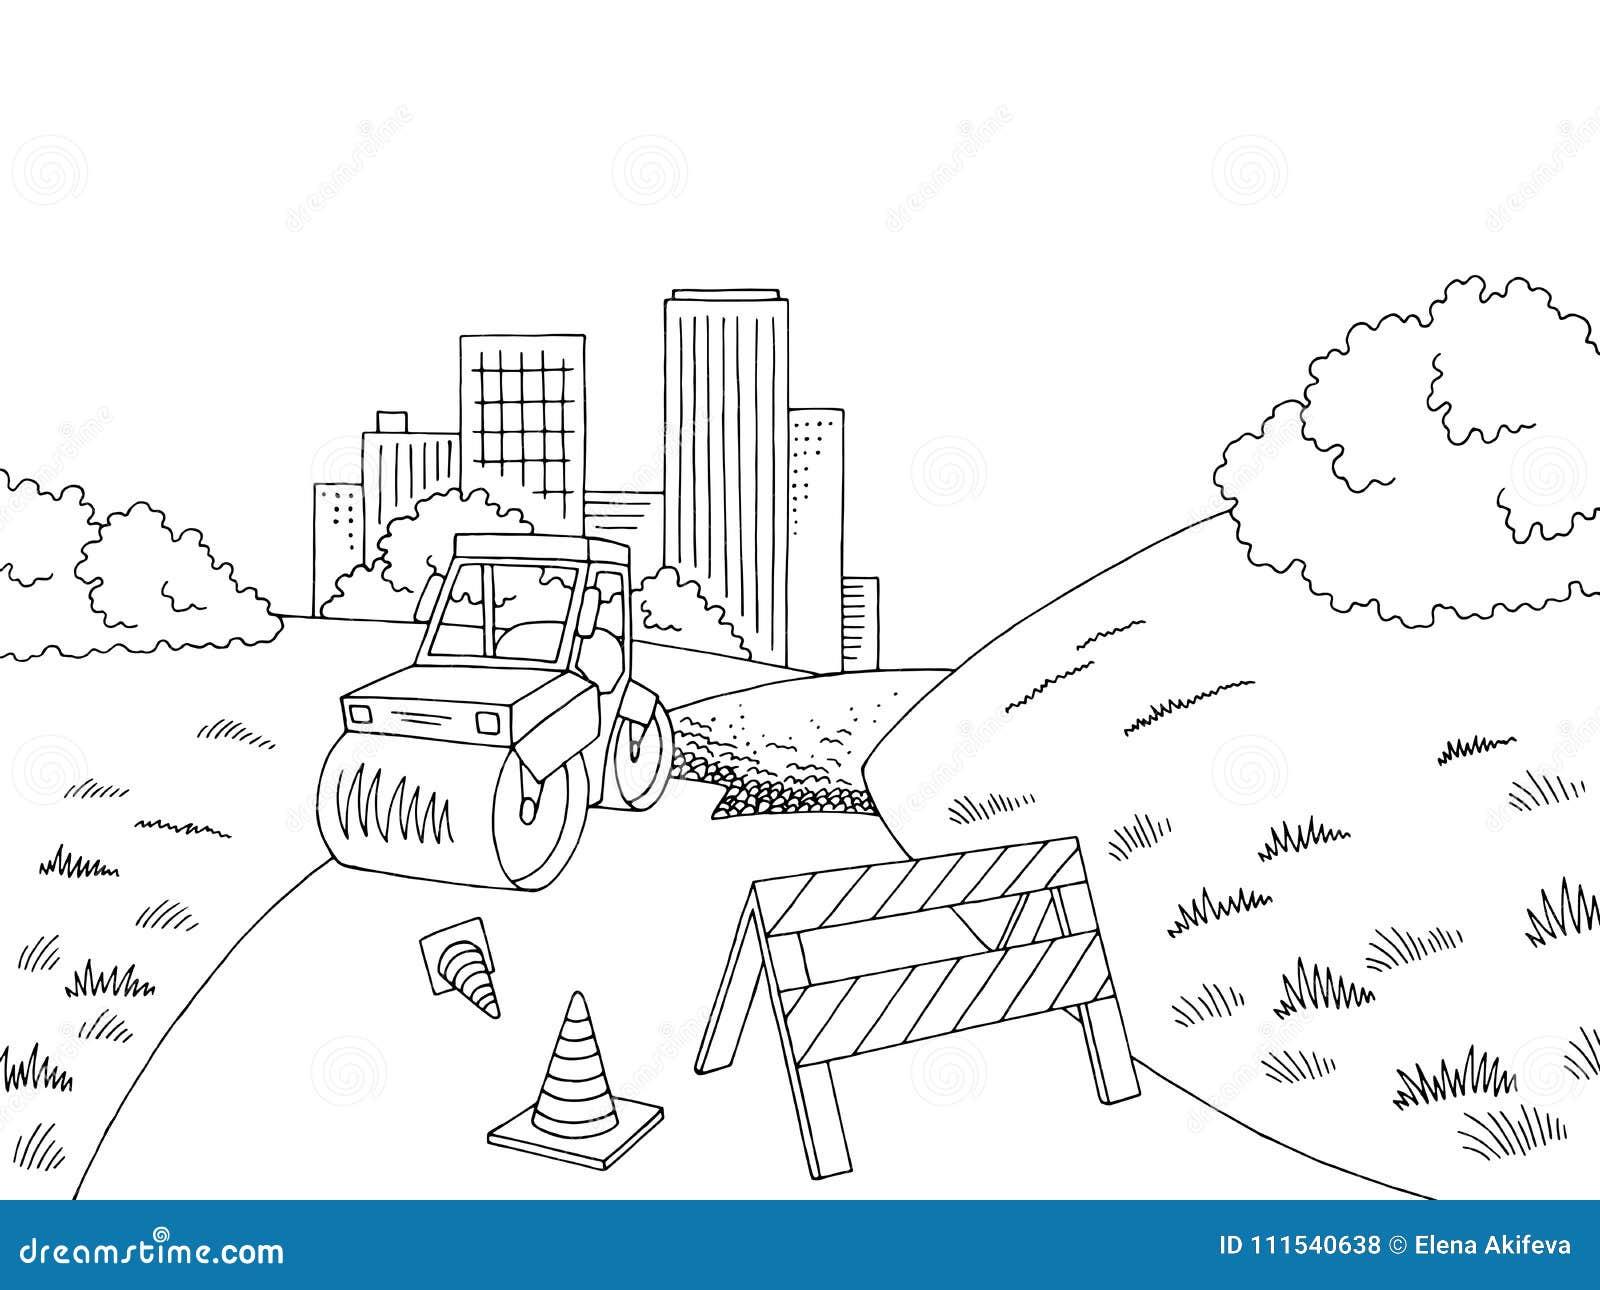 Road Construction Graphic Black White City Landscape Sketch Illustration Vector Stock Vector Illustration Of Contour Outdoors 111540638